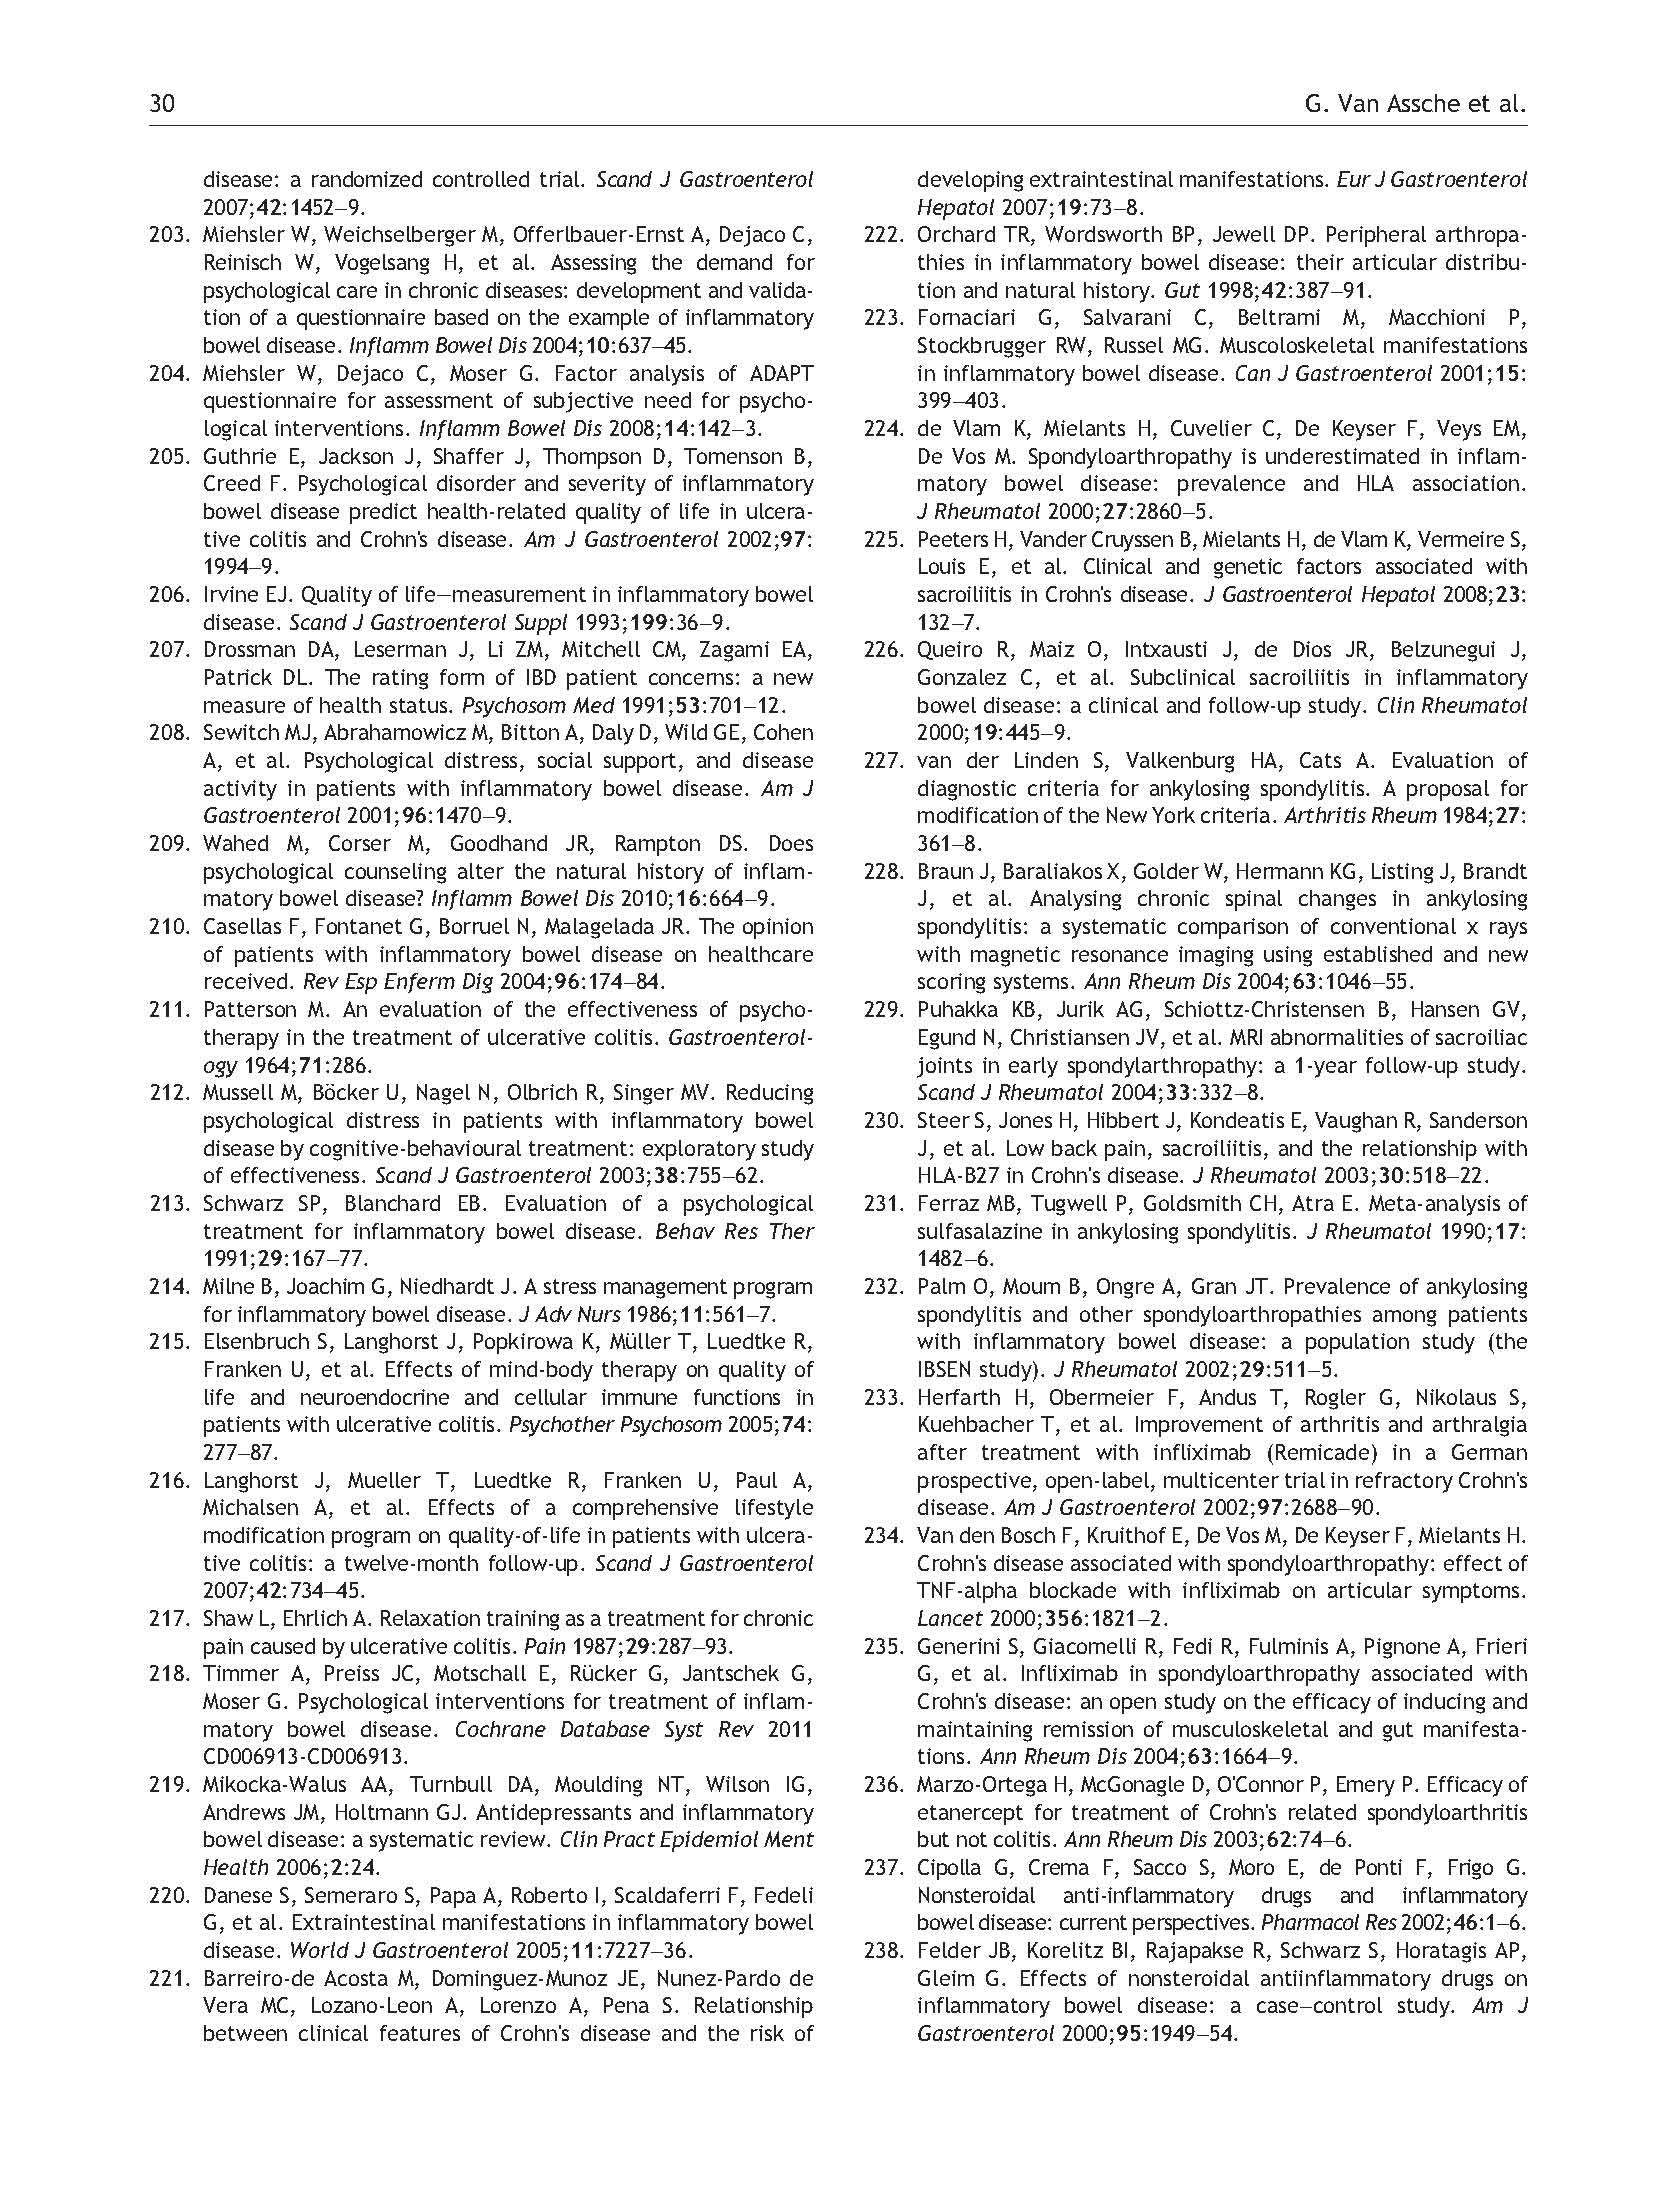 2012-ECCO第二版-欧洲询证共识:溃疡性结肠炎的诊断和处理—特殊情况_页面_30.jpg